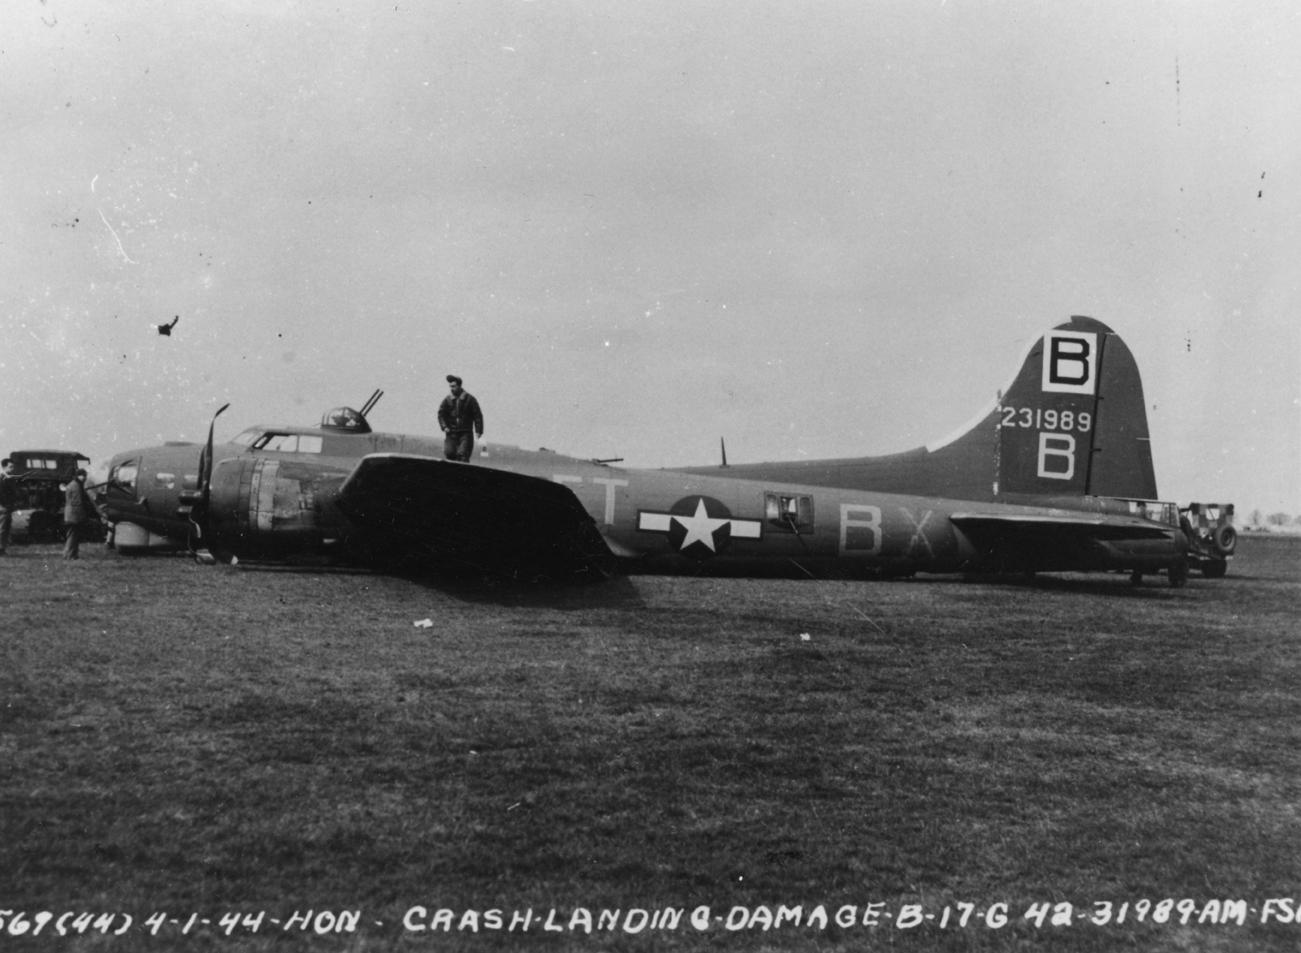 B-17 42-31989